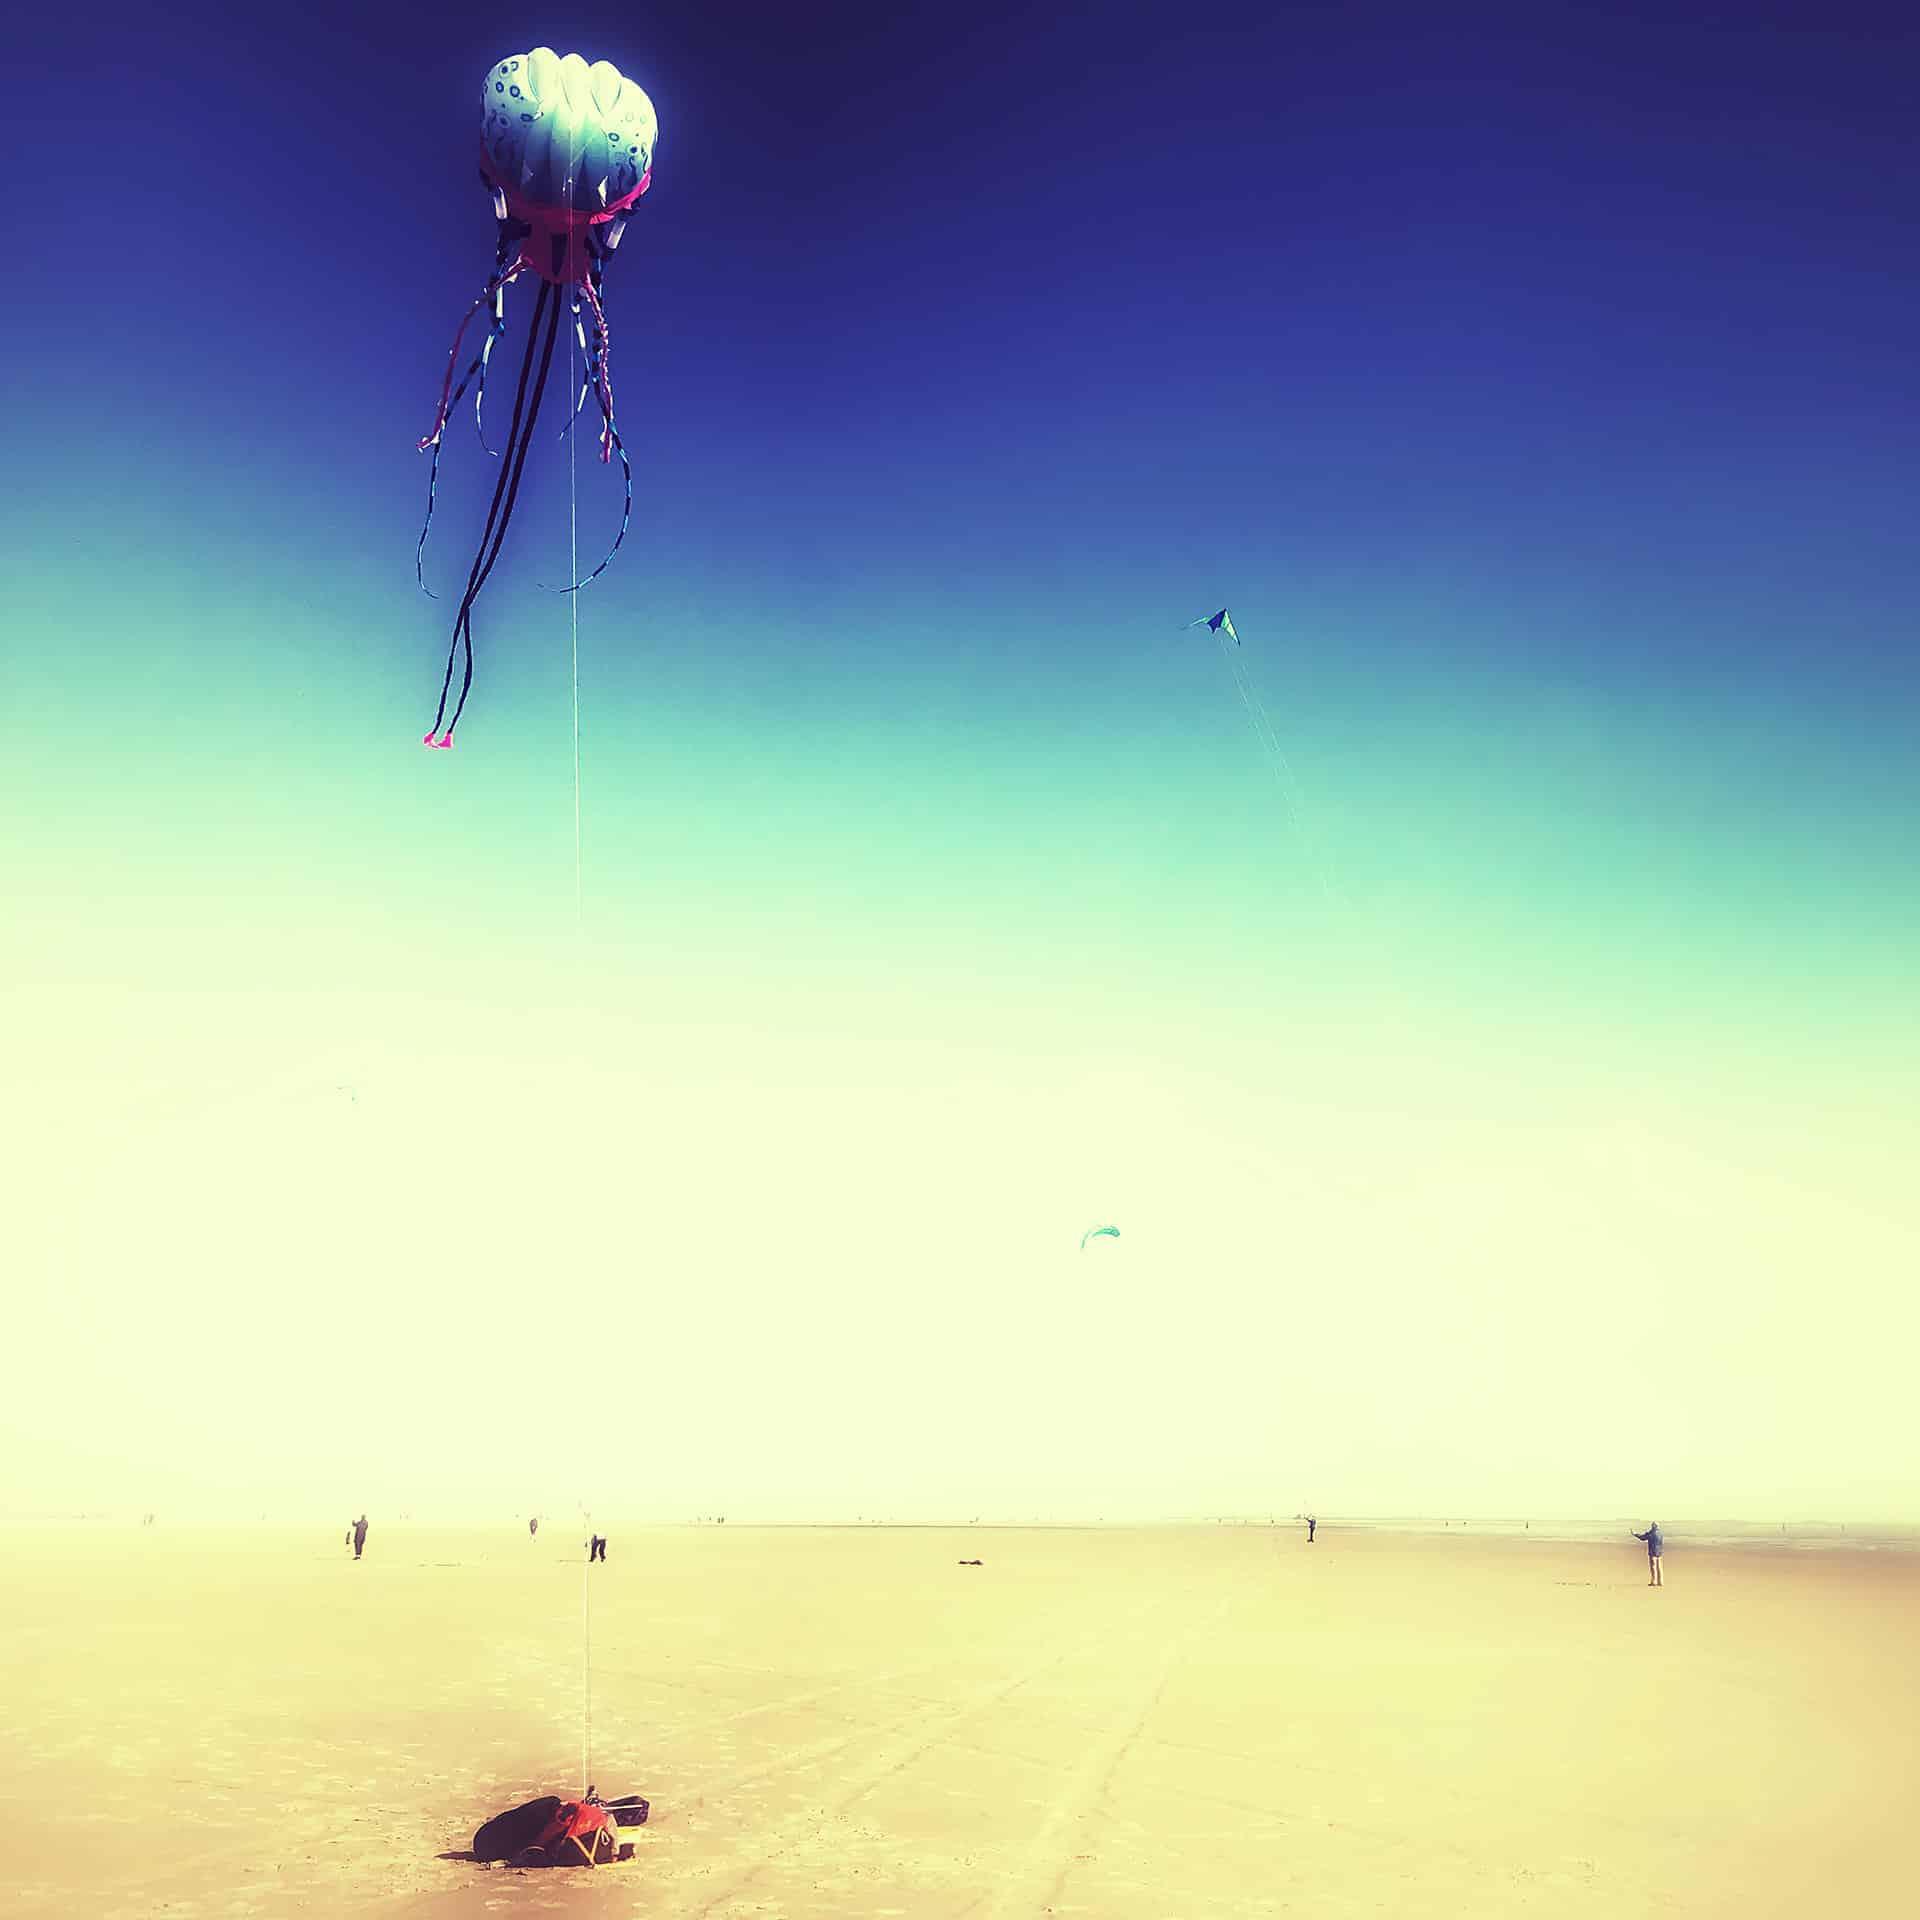 00588 - artnorama dream_kite